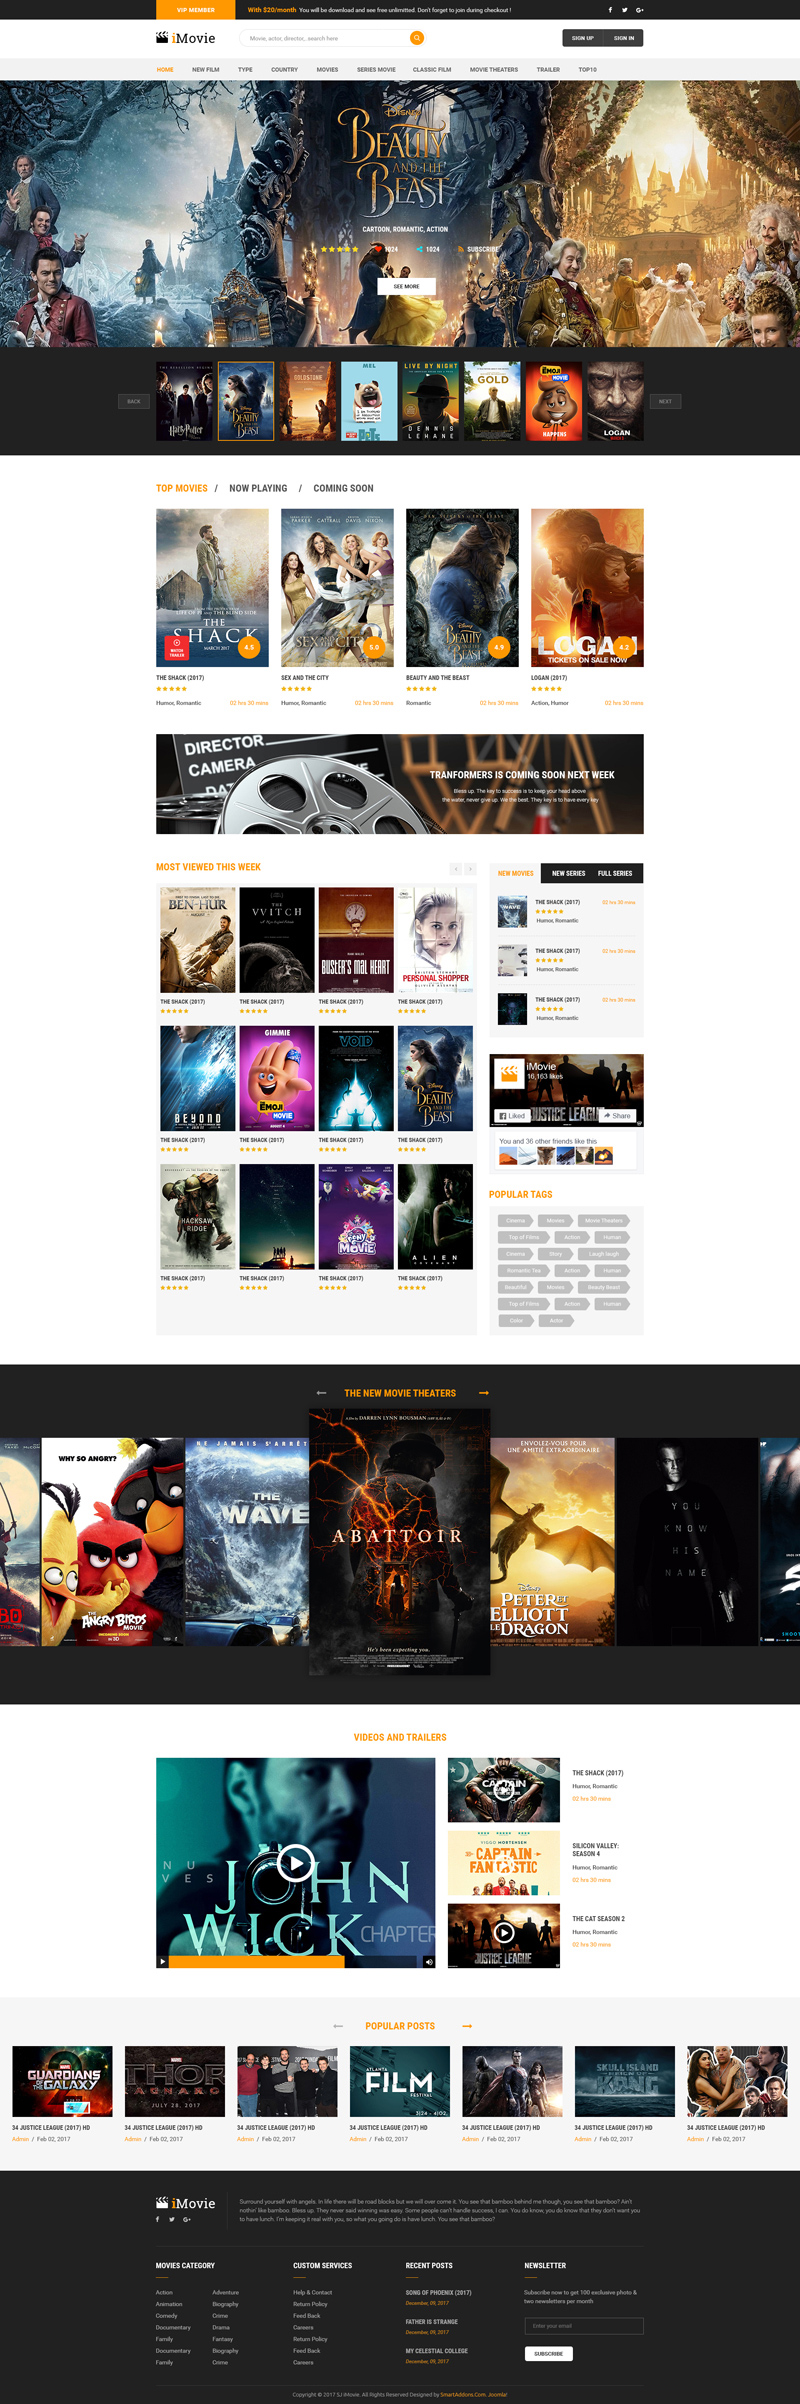 PREVIEW] Sj iMovie - Responsive Movies, Entertainment Joomla ...